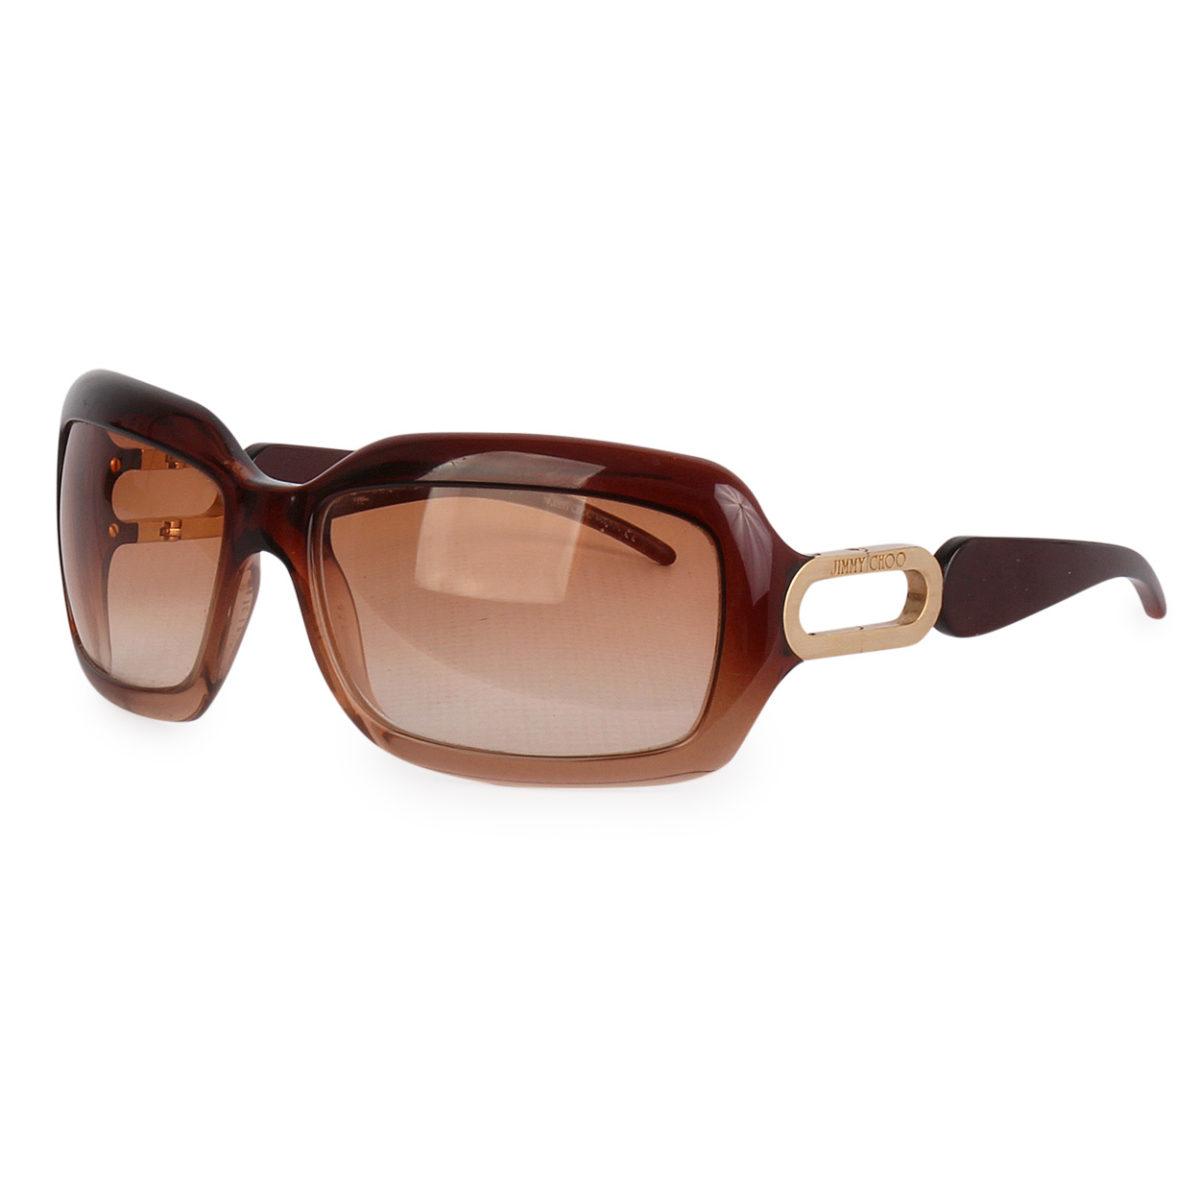 7ff7767019 JIMMY CHOO Rectangle Sunglasses Brown